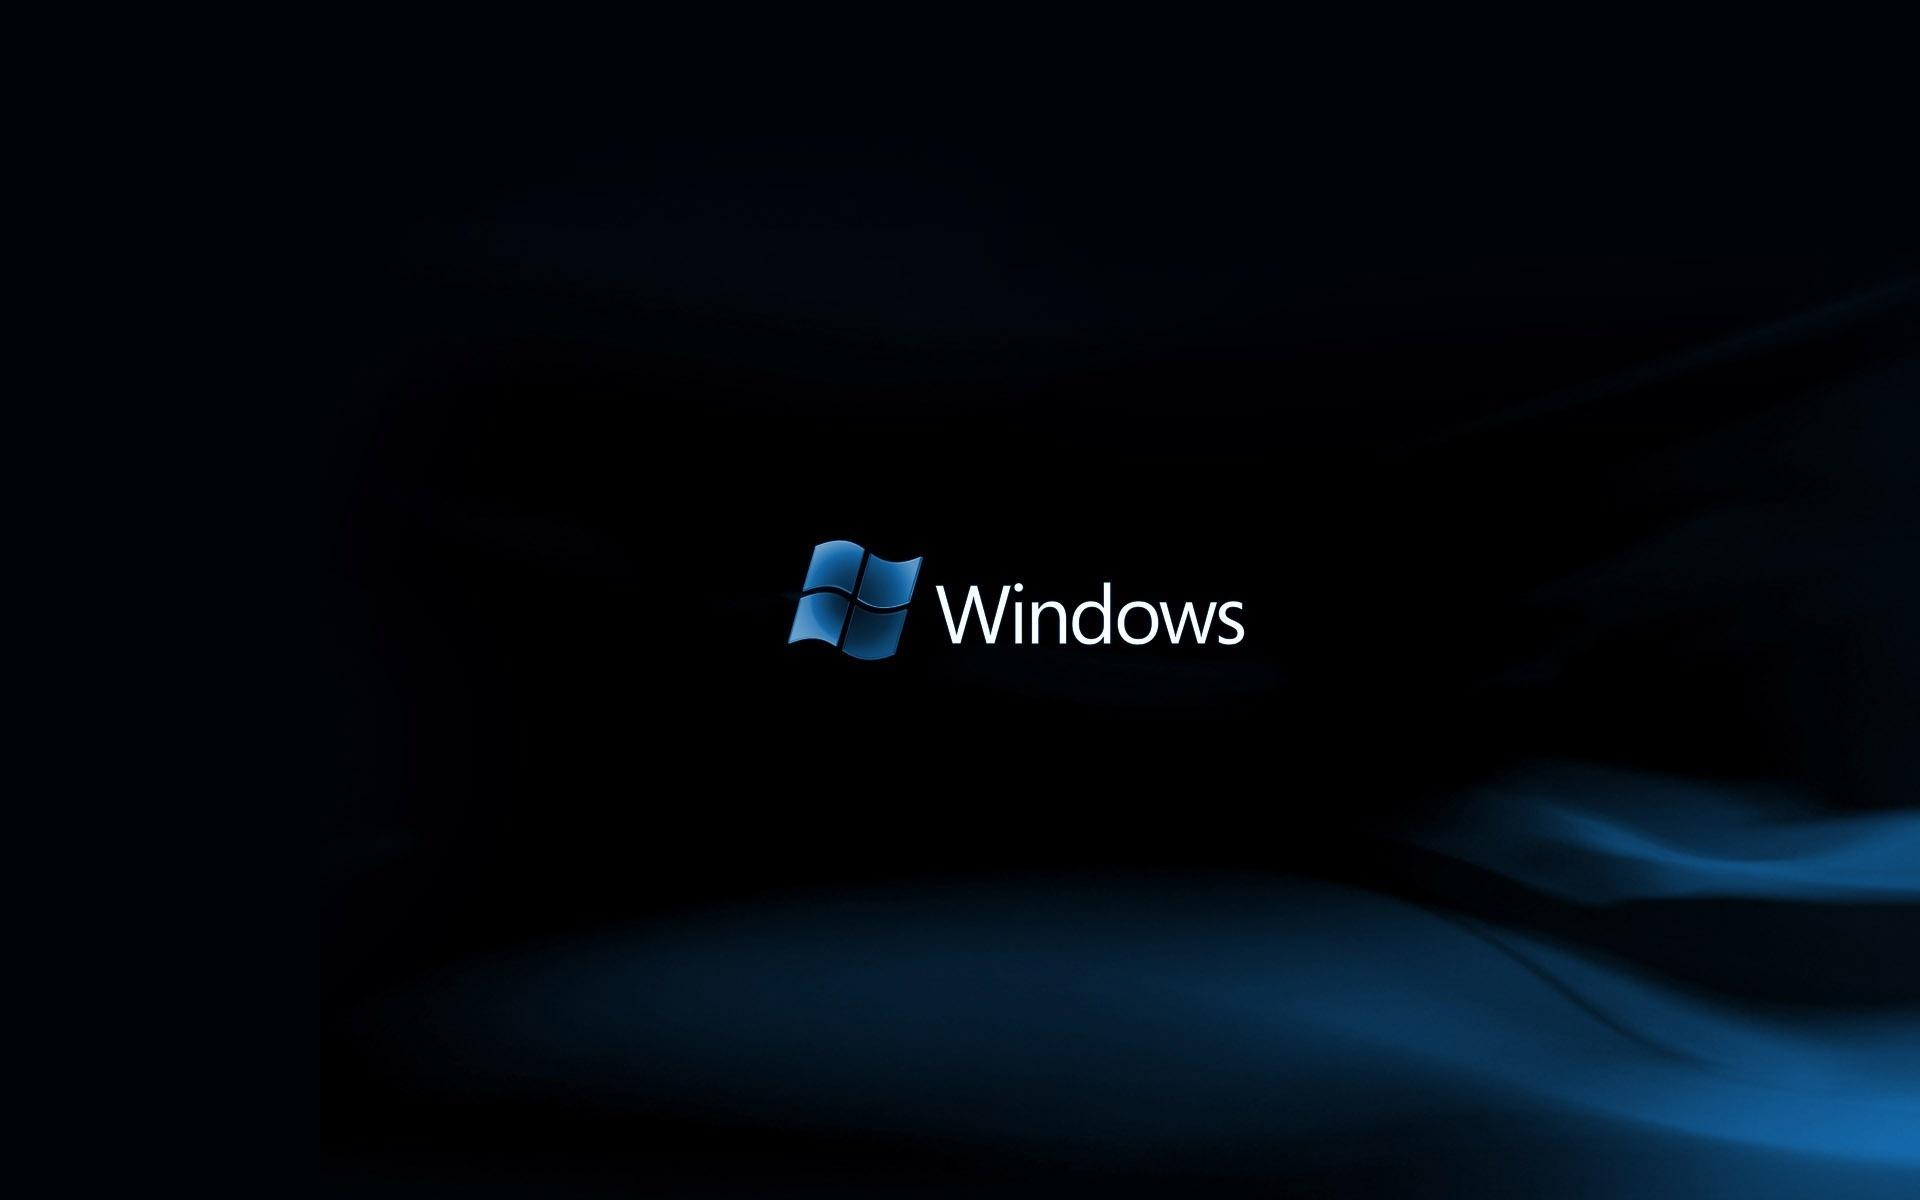 1920x1200px Dark Windows Background 520965 1920x1200